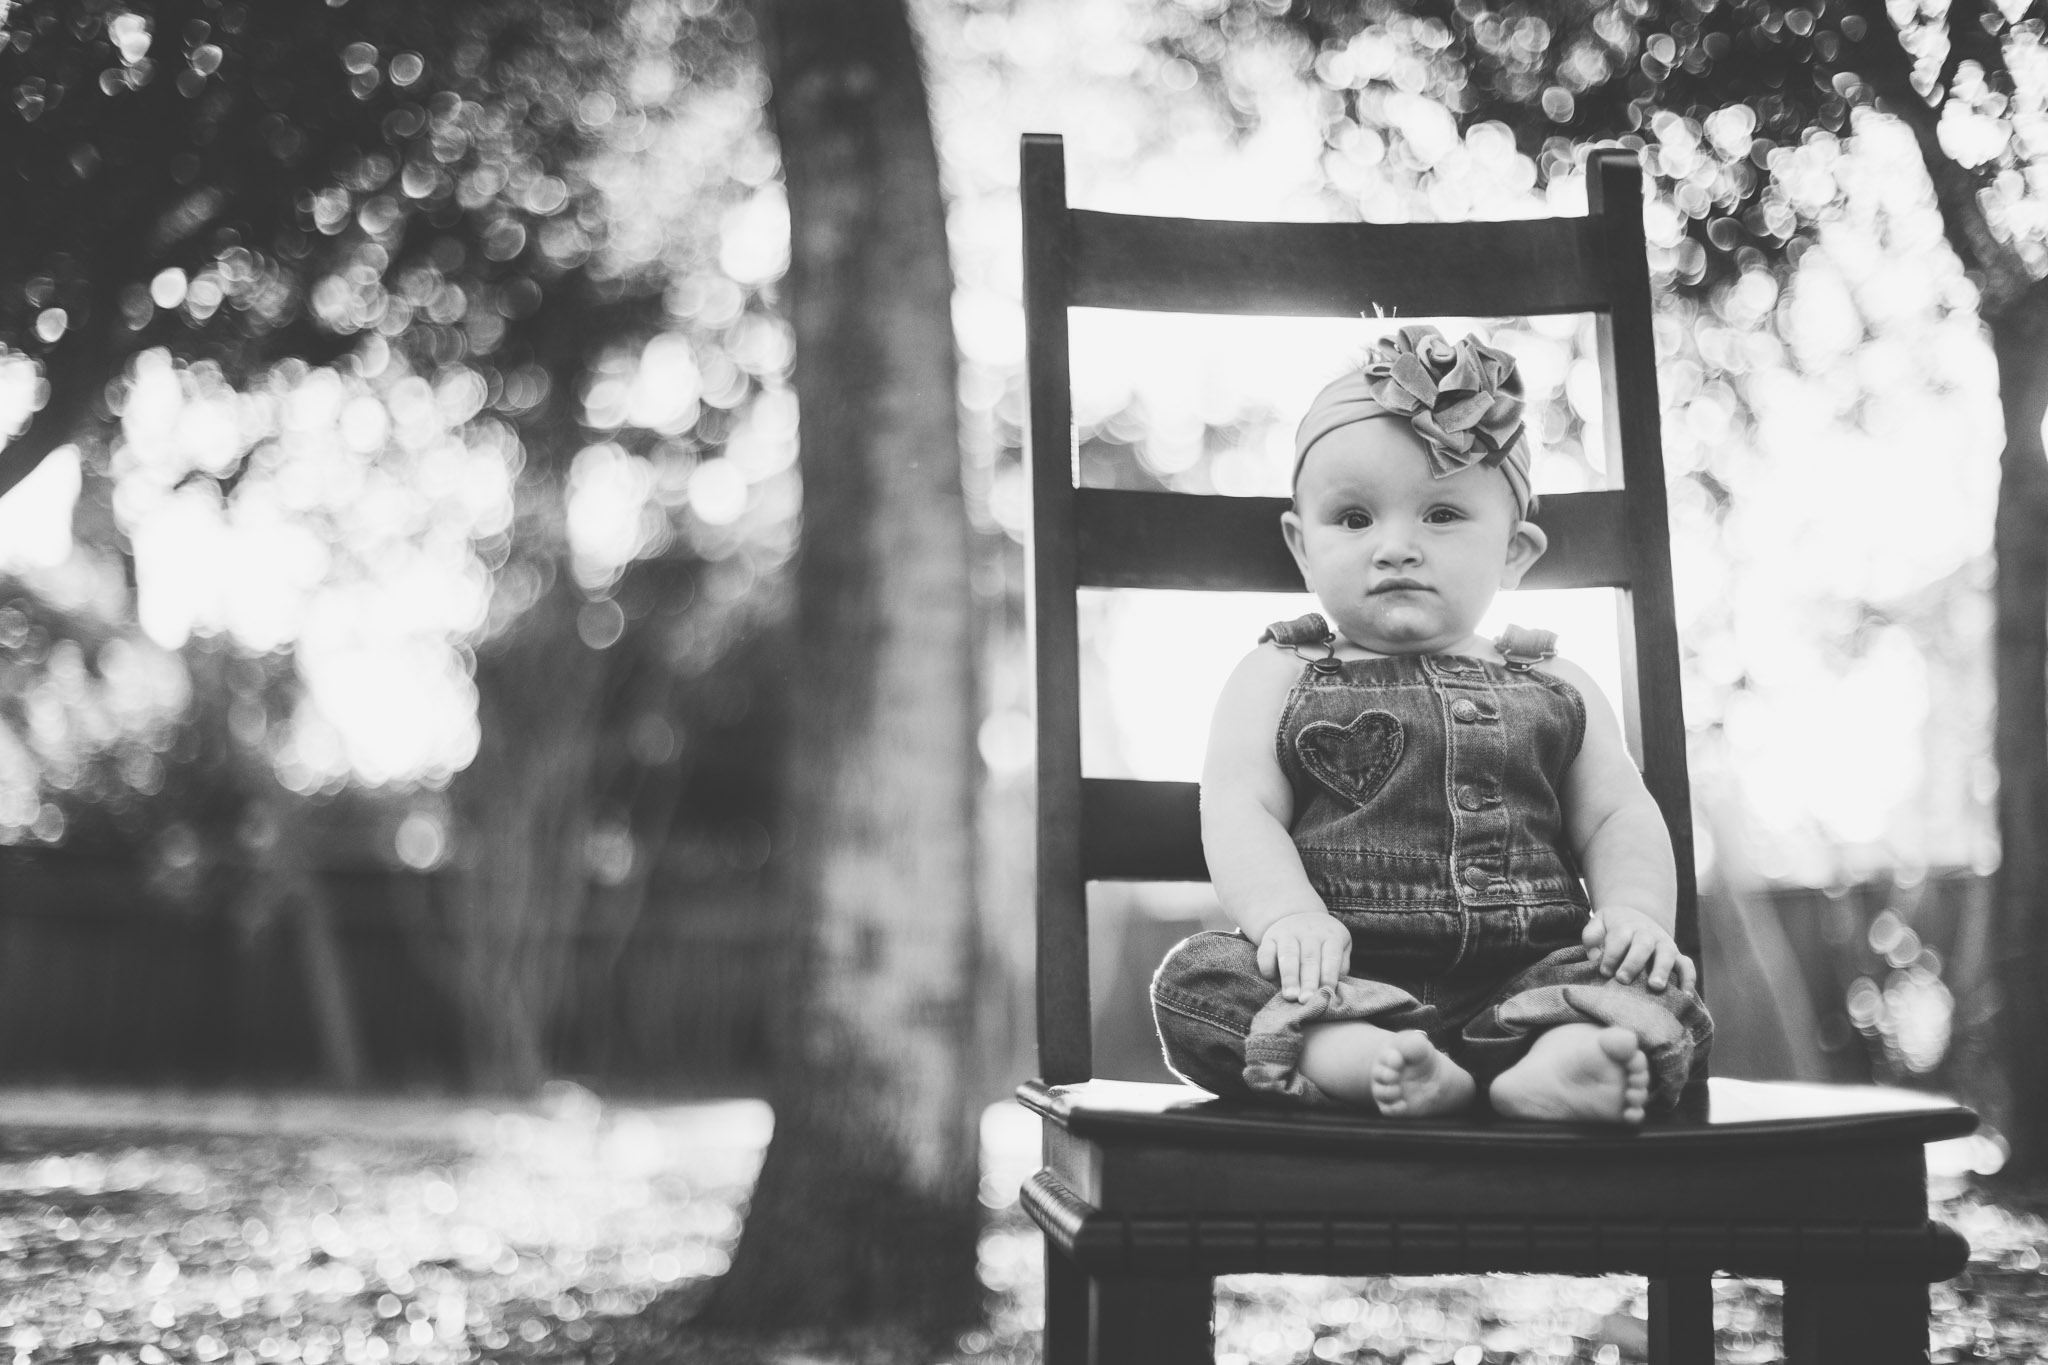 Archer_Inspired_Photography_Allie_First_Birthday_Cake_Smash_Morgan_Hill_California_Family_Photographer-49.jpg